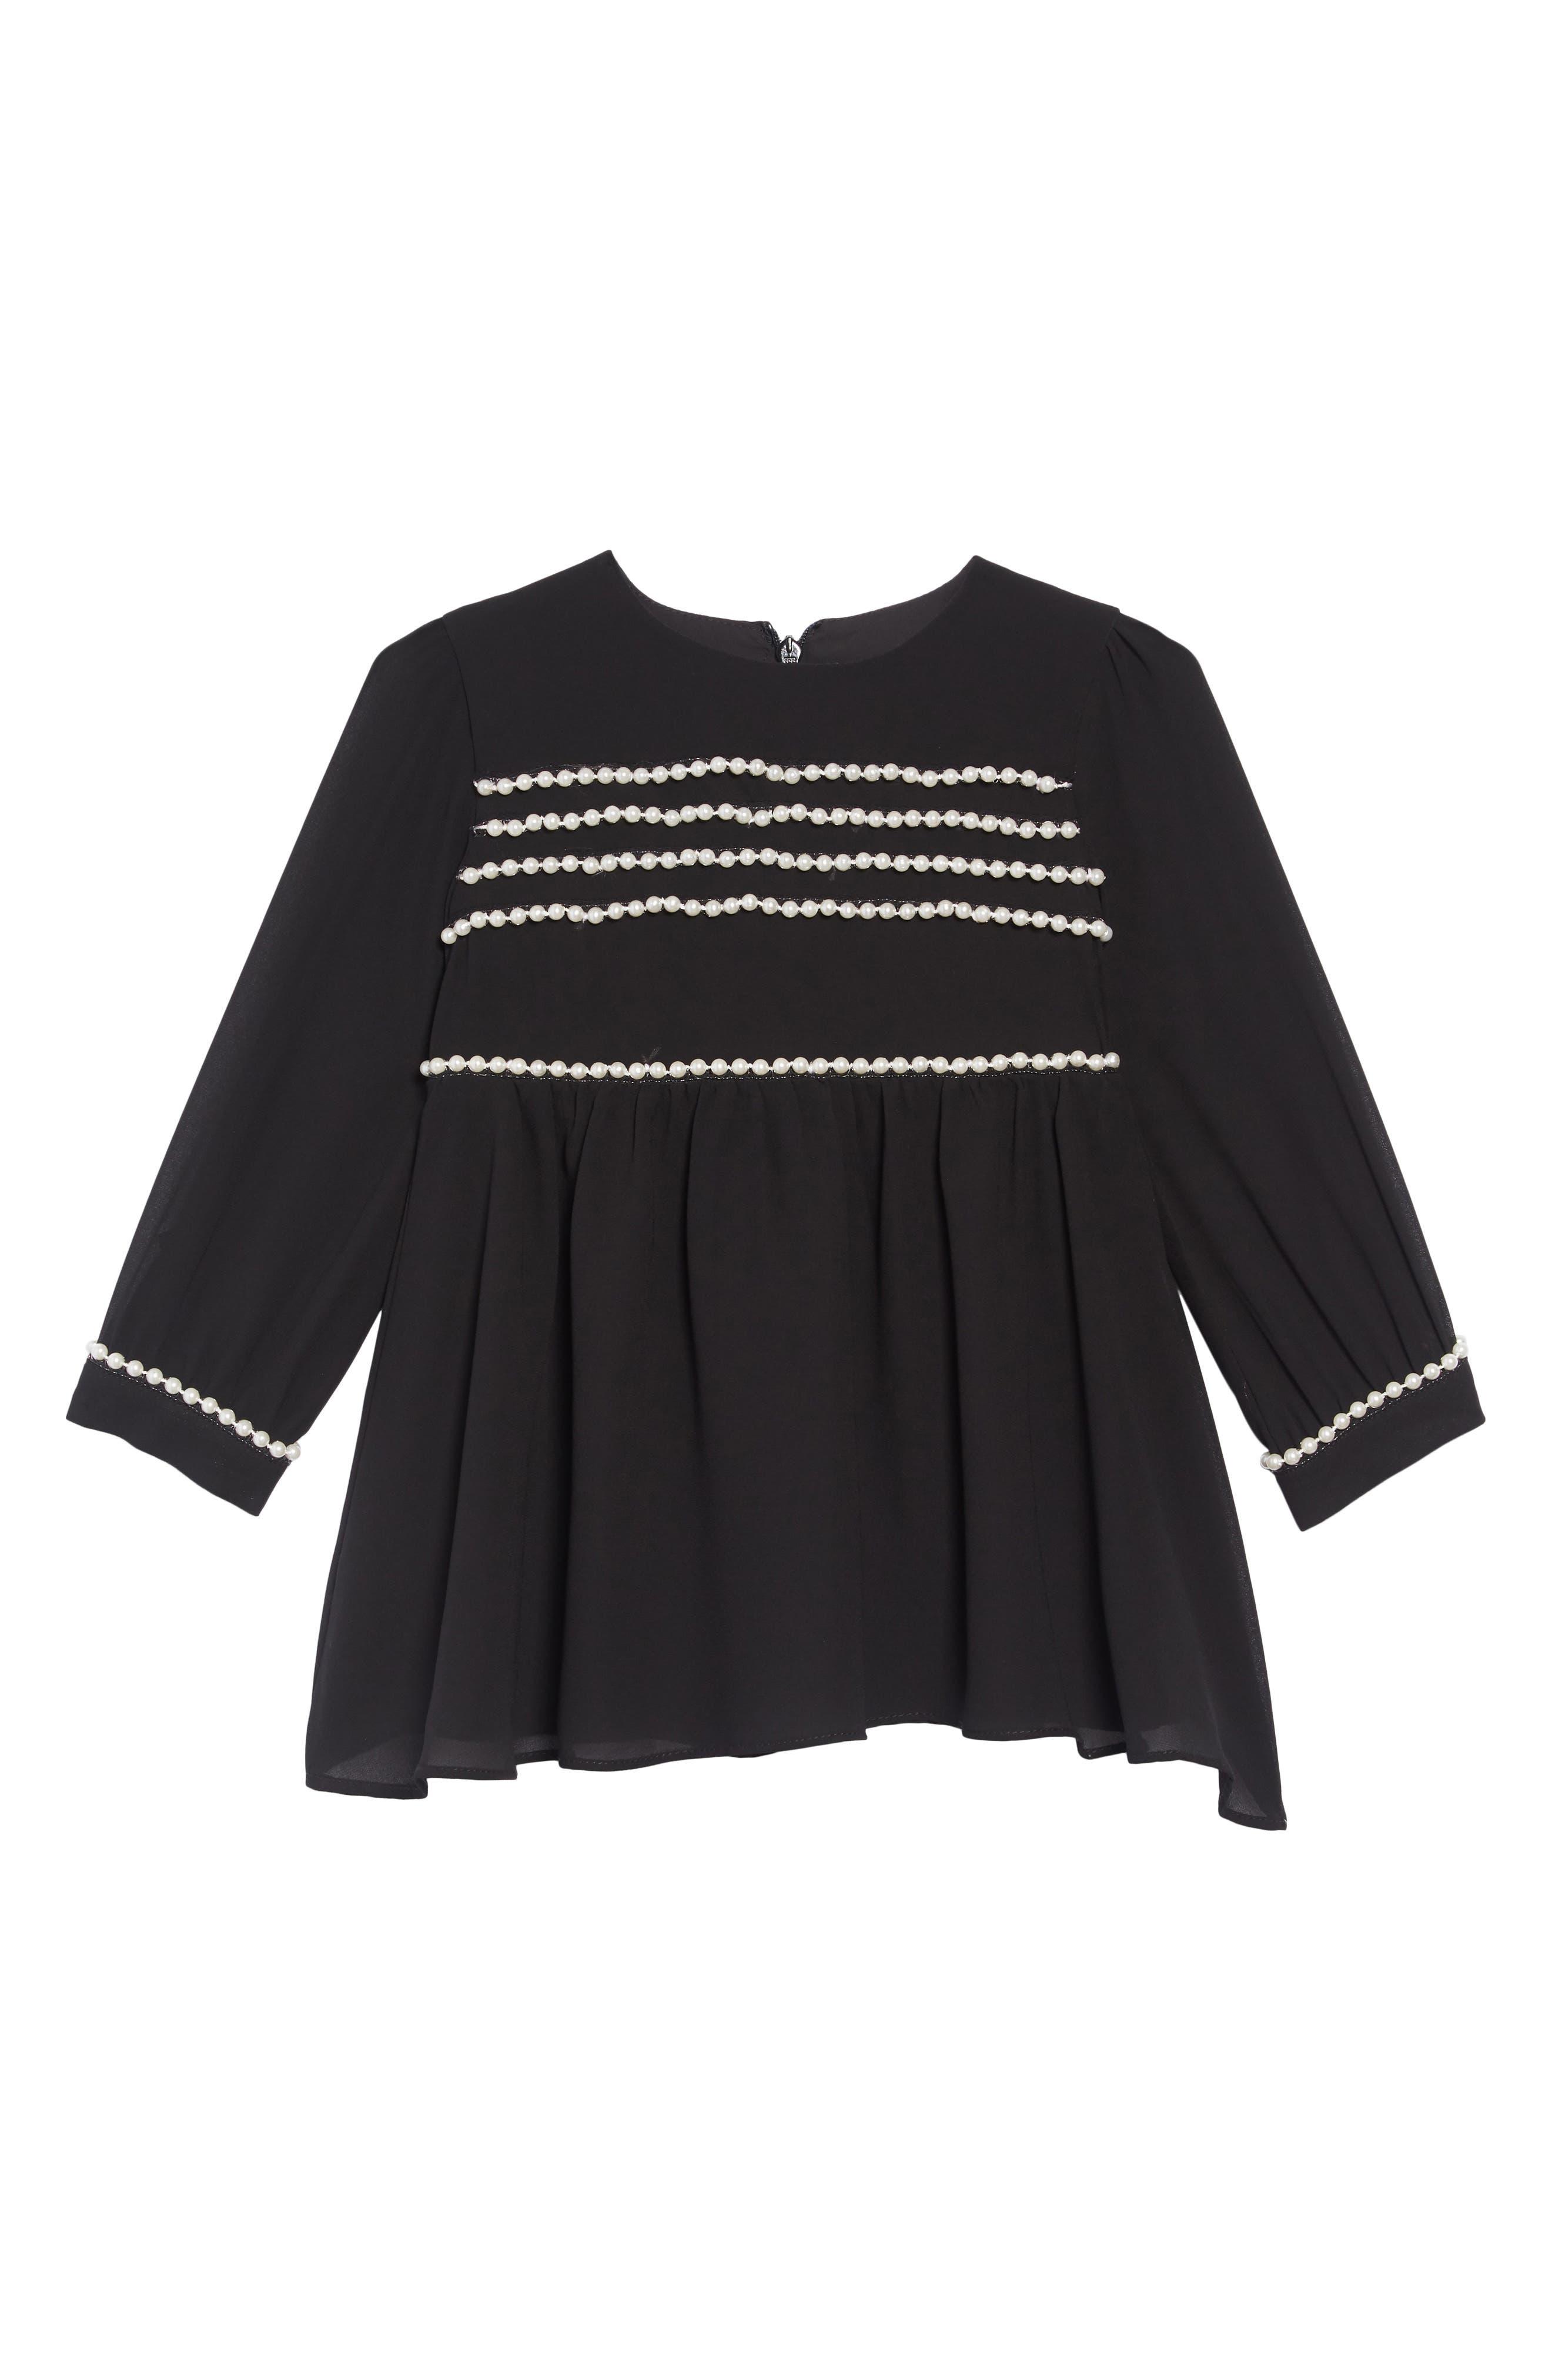 Valentina Embellished Dress,                             Main thumbnail 1, color,                             JET BLACK